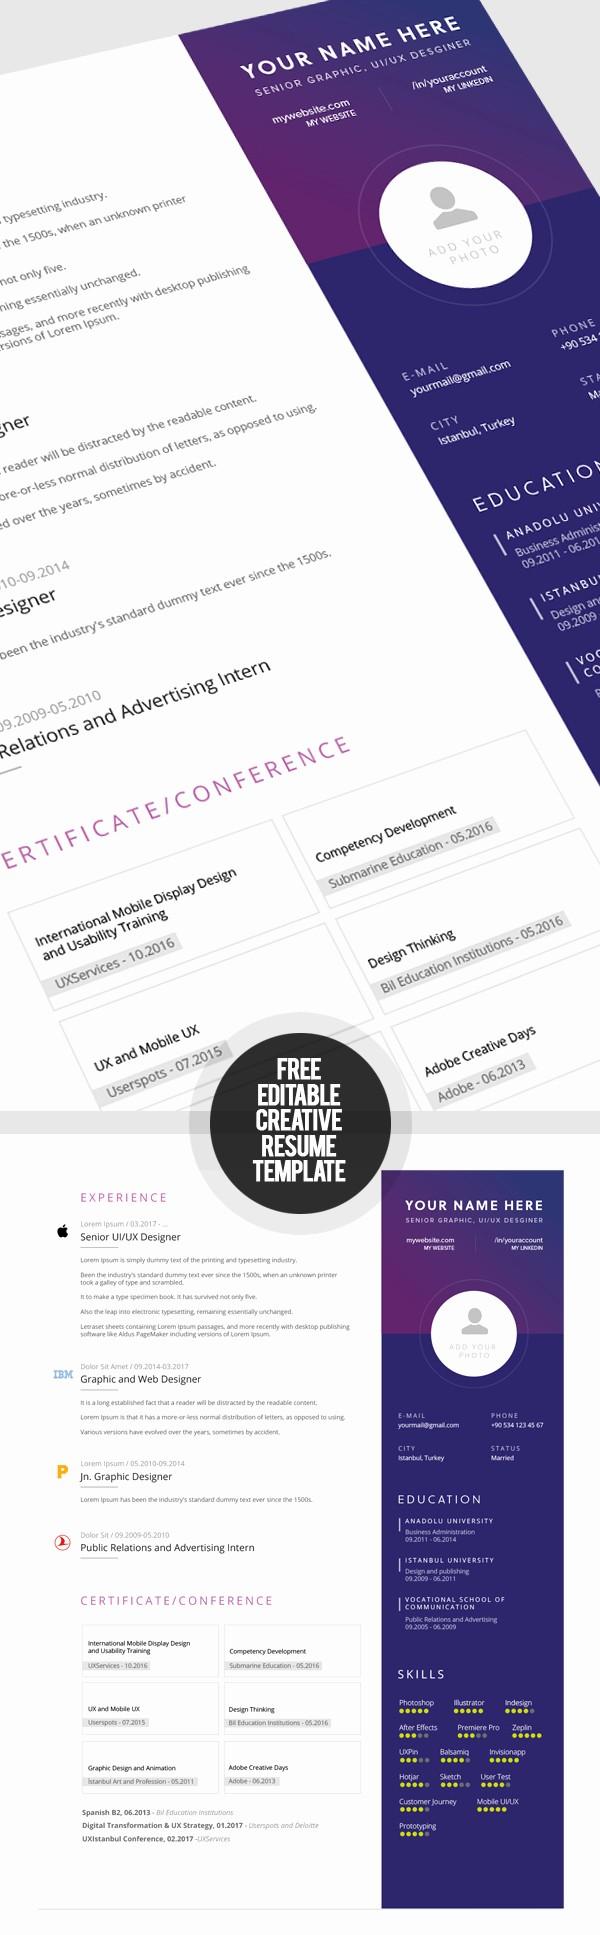 Free Creative Cover Letter Templates Unique 23 Free Creative Resume Templates with Cover Letter